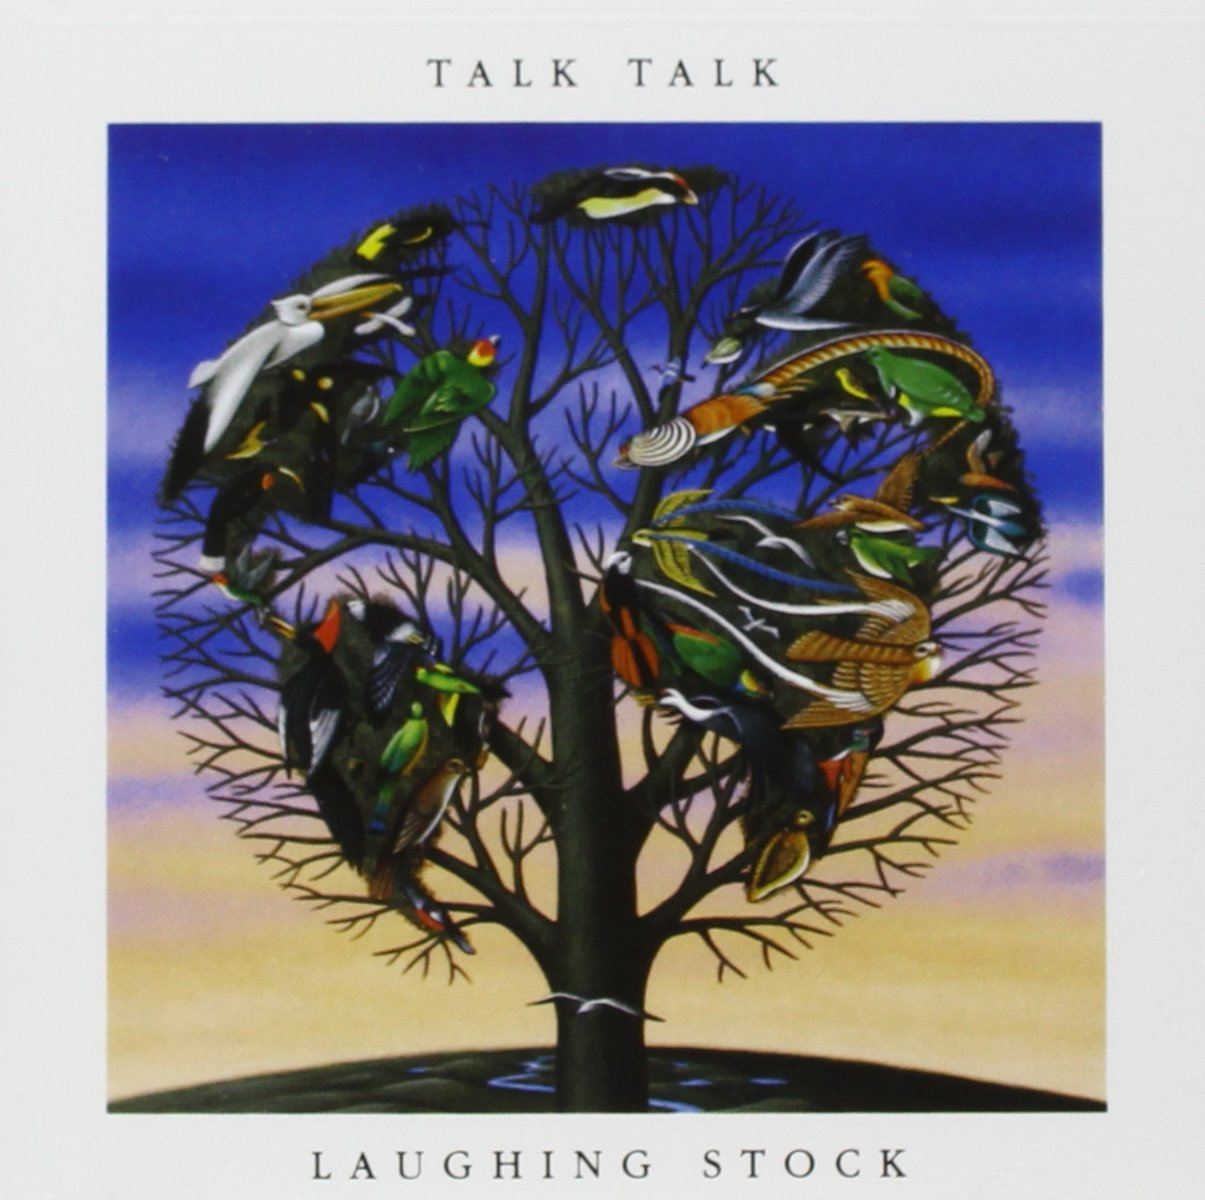 Talk Talk 'Laughing Stock' (1991)